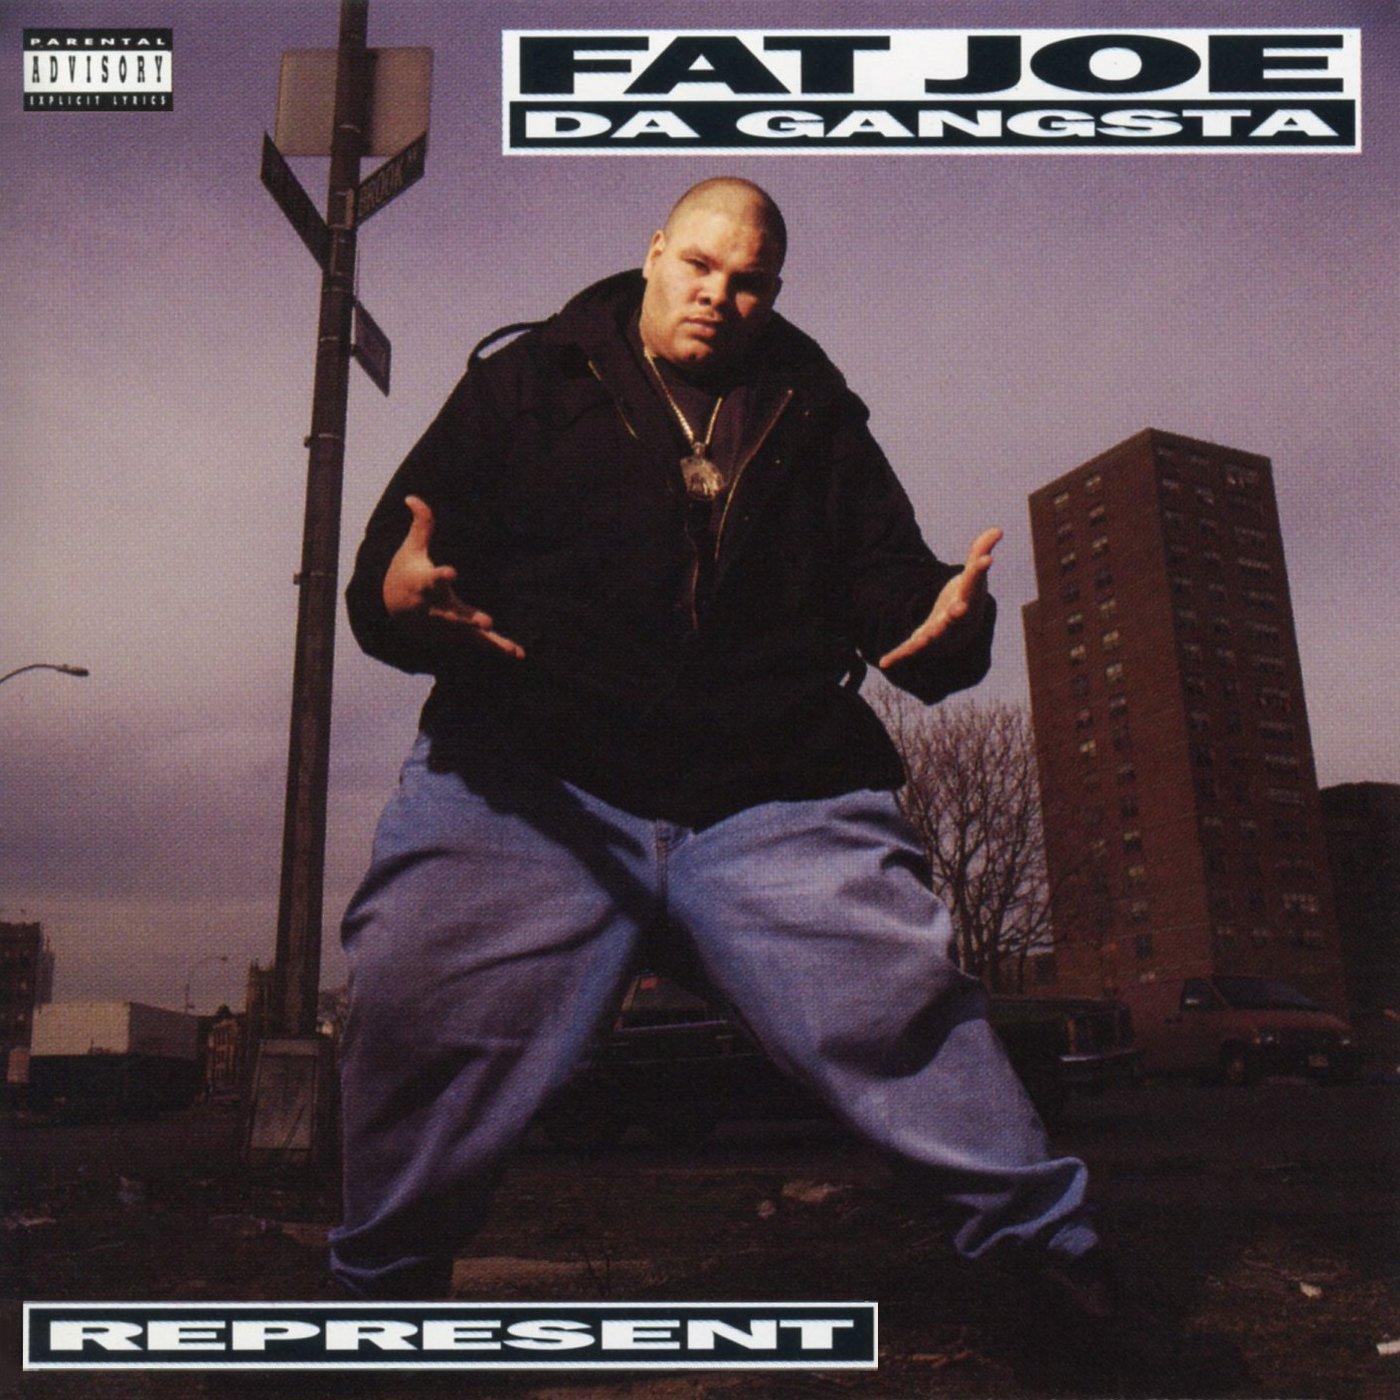 Fat Joe Da Gangsta - Represent (1993) [FLAC] Download